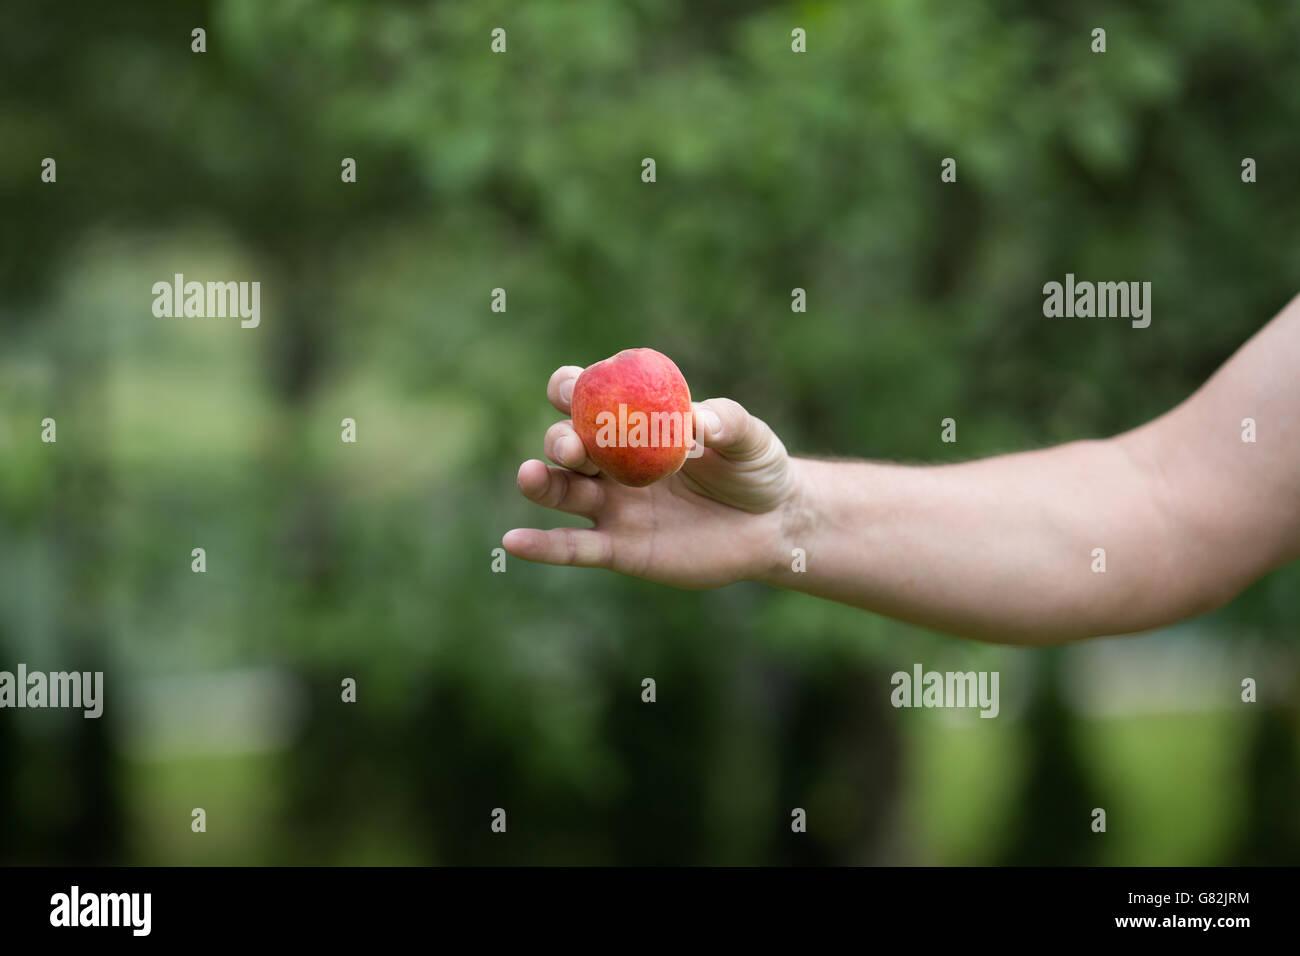 Man holding apricot - Stock Image